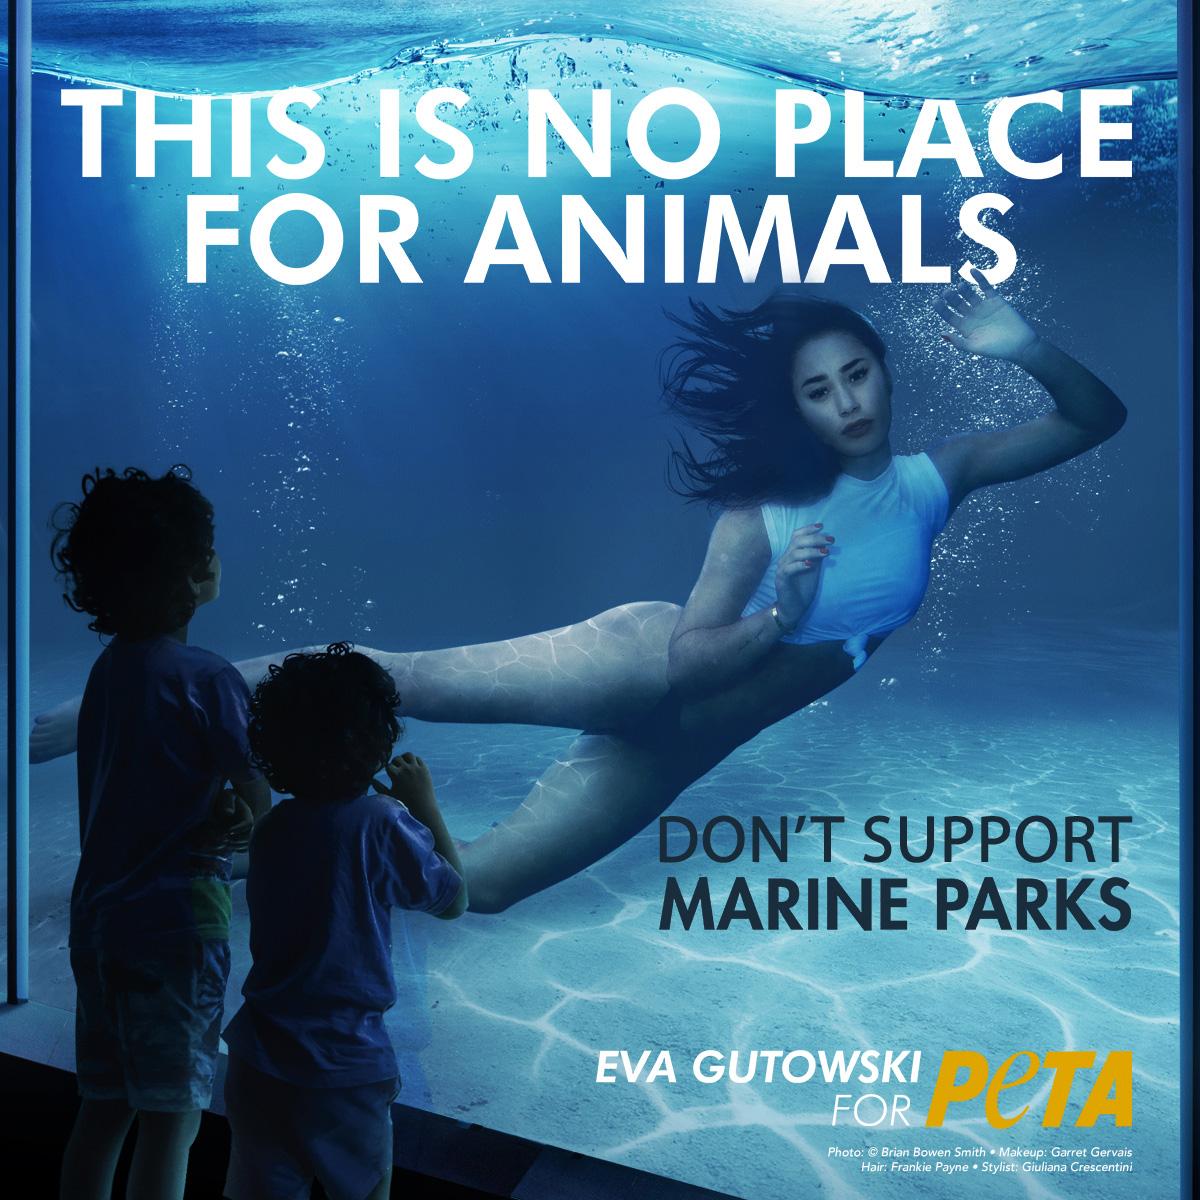 Eva Gutowski Marine Parks Ad 2019_IG.jpg